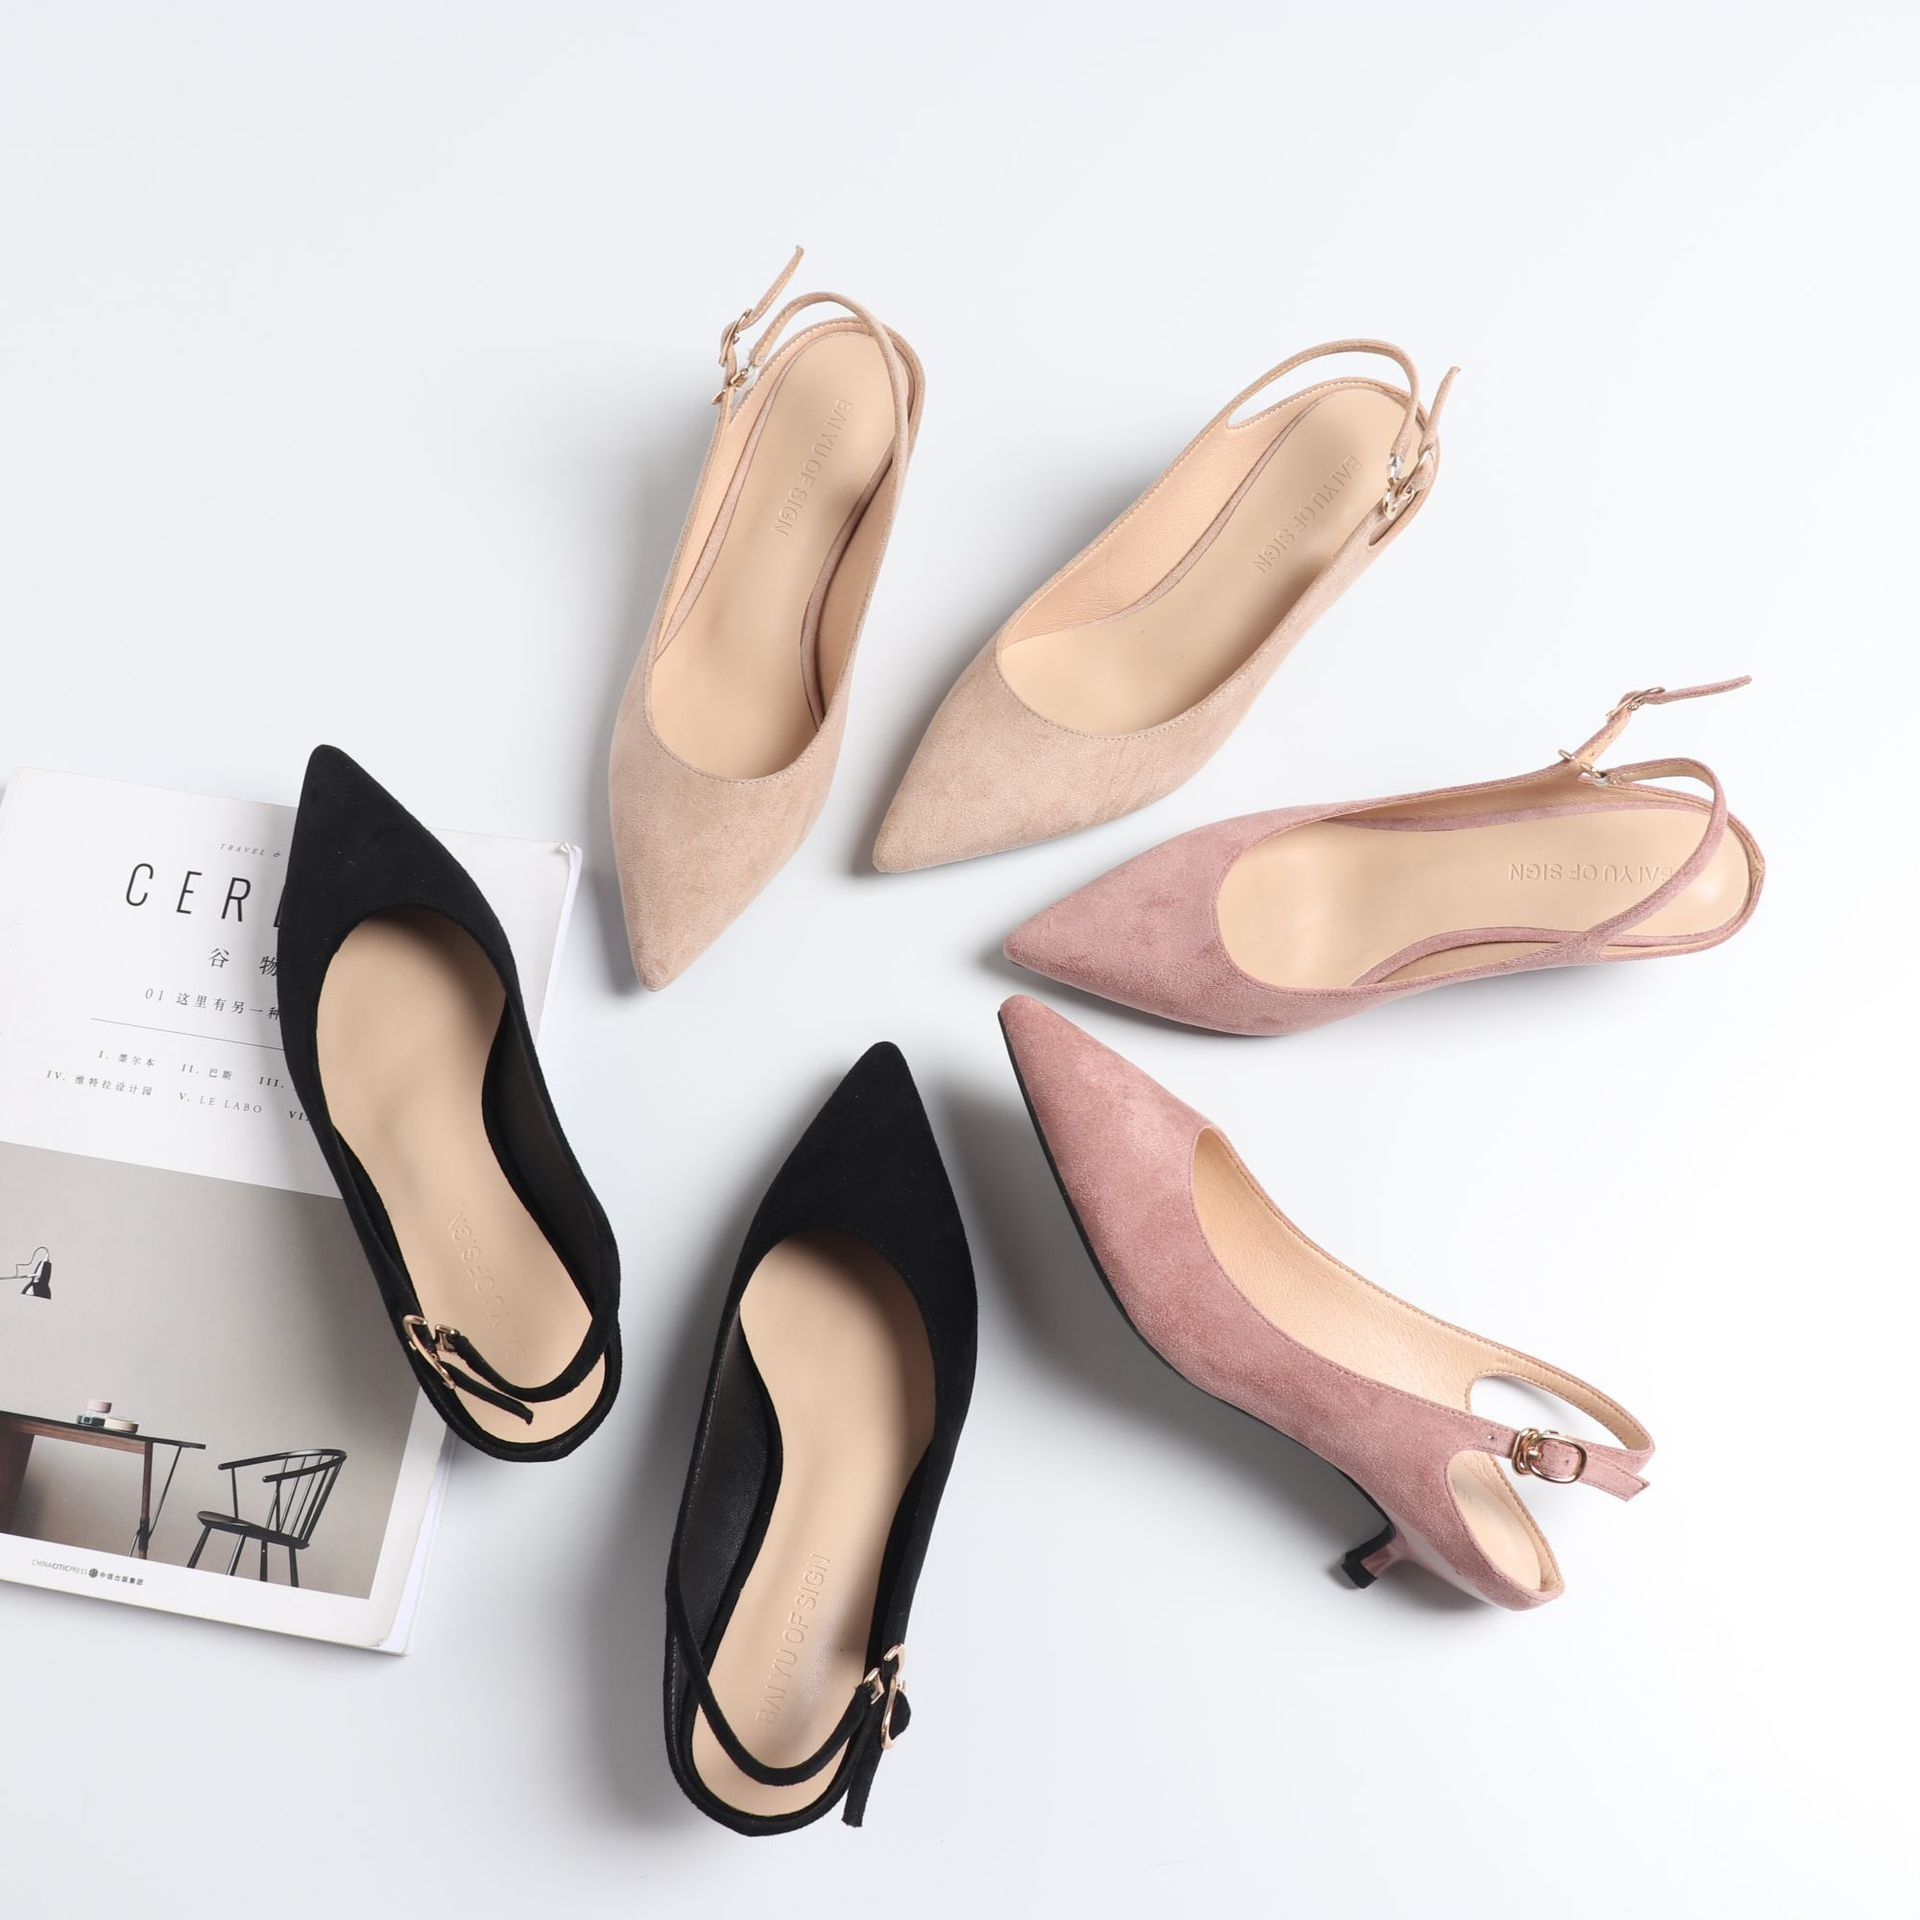 Ladies Slingbacks High Heels Shoes Woman 2019 Spring Flock Pointed Toe Casual High Pumps High Heels Female Wedding Sandals Pumps